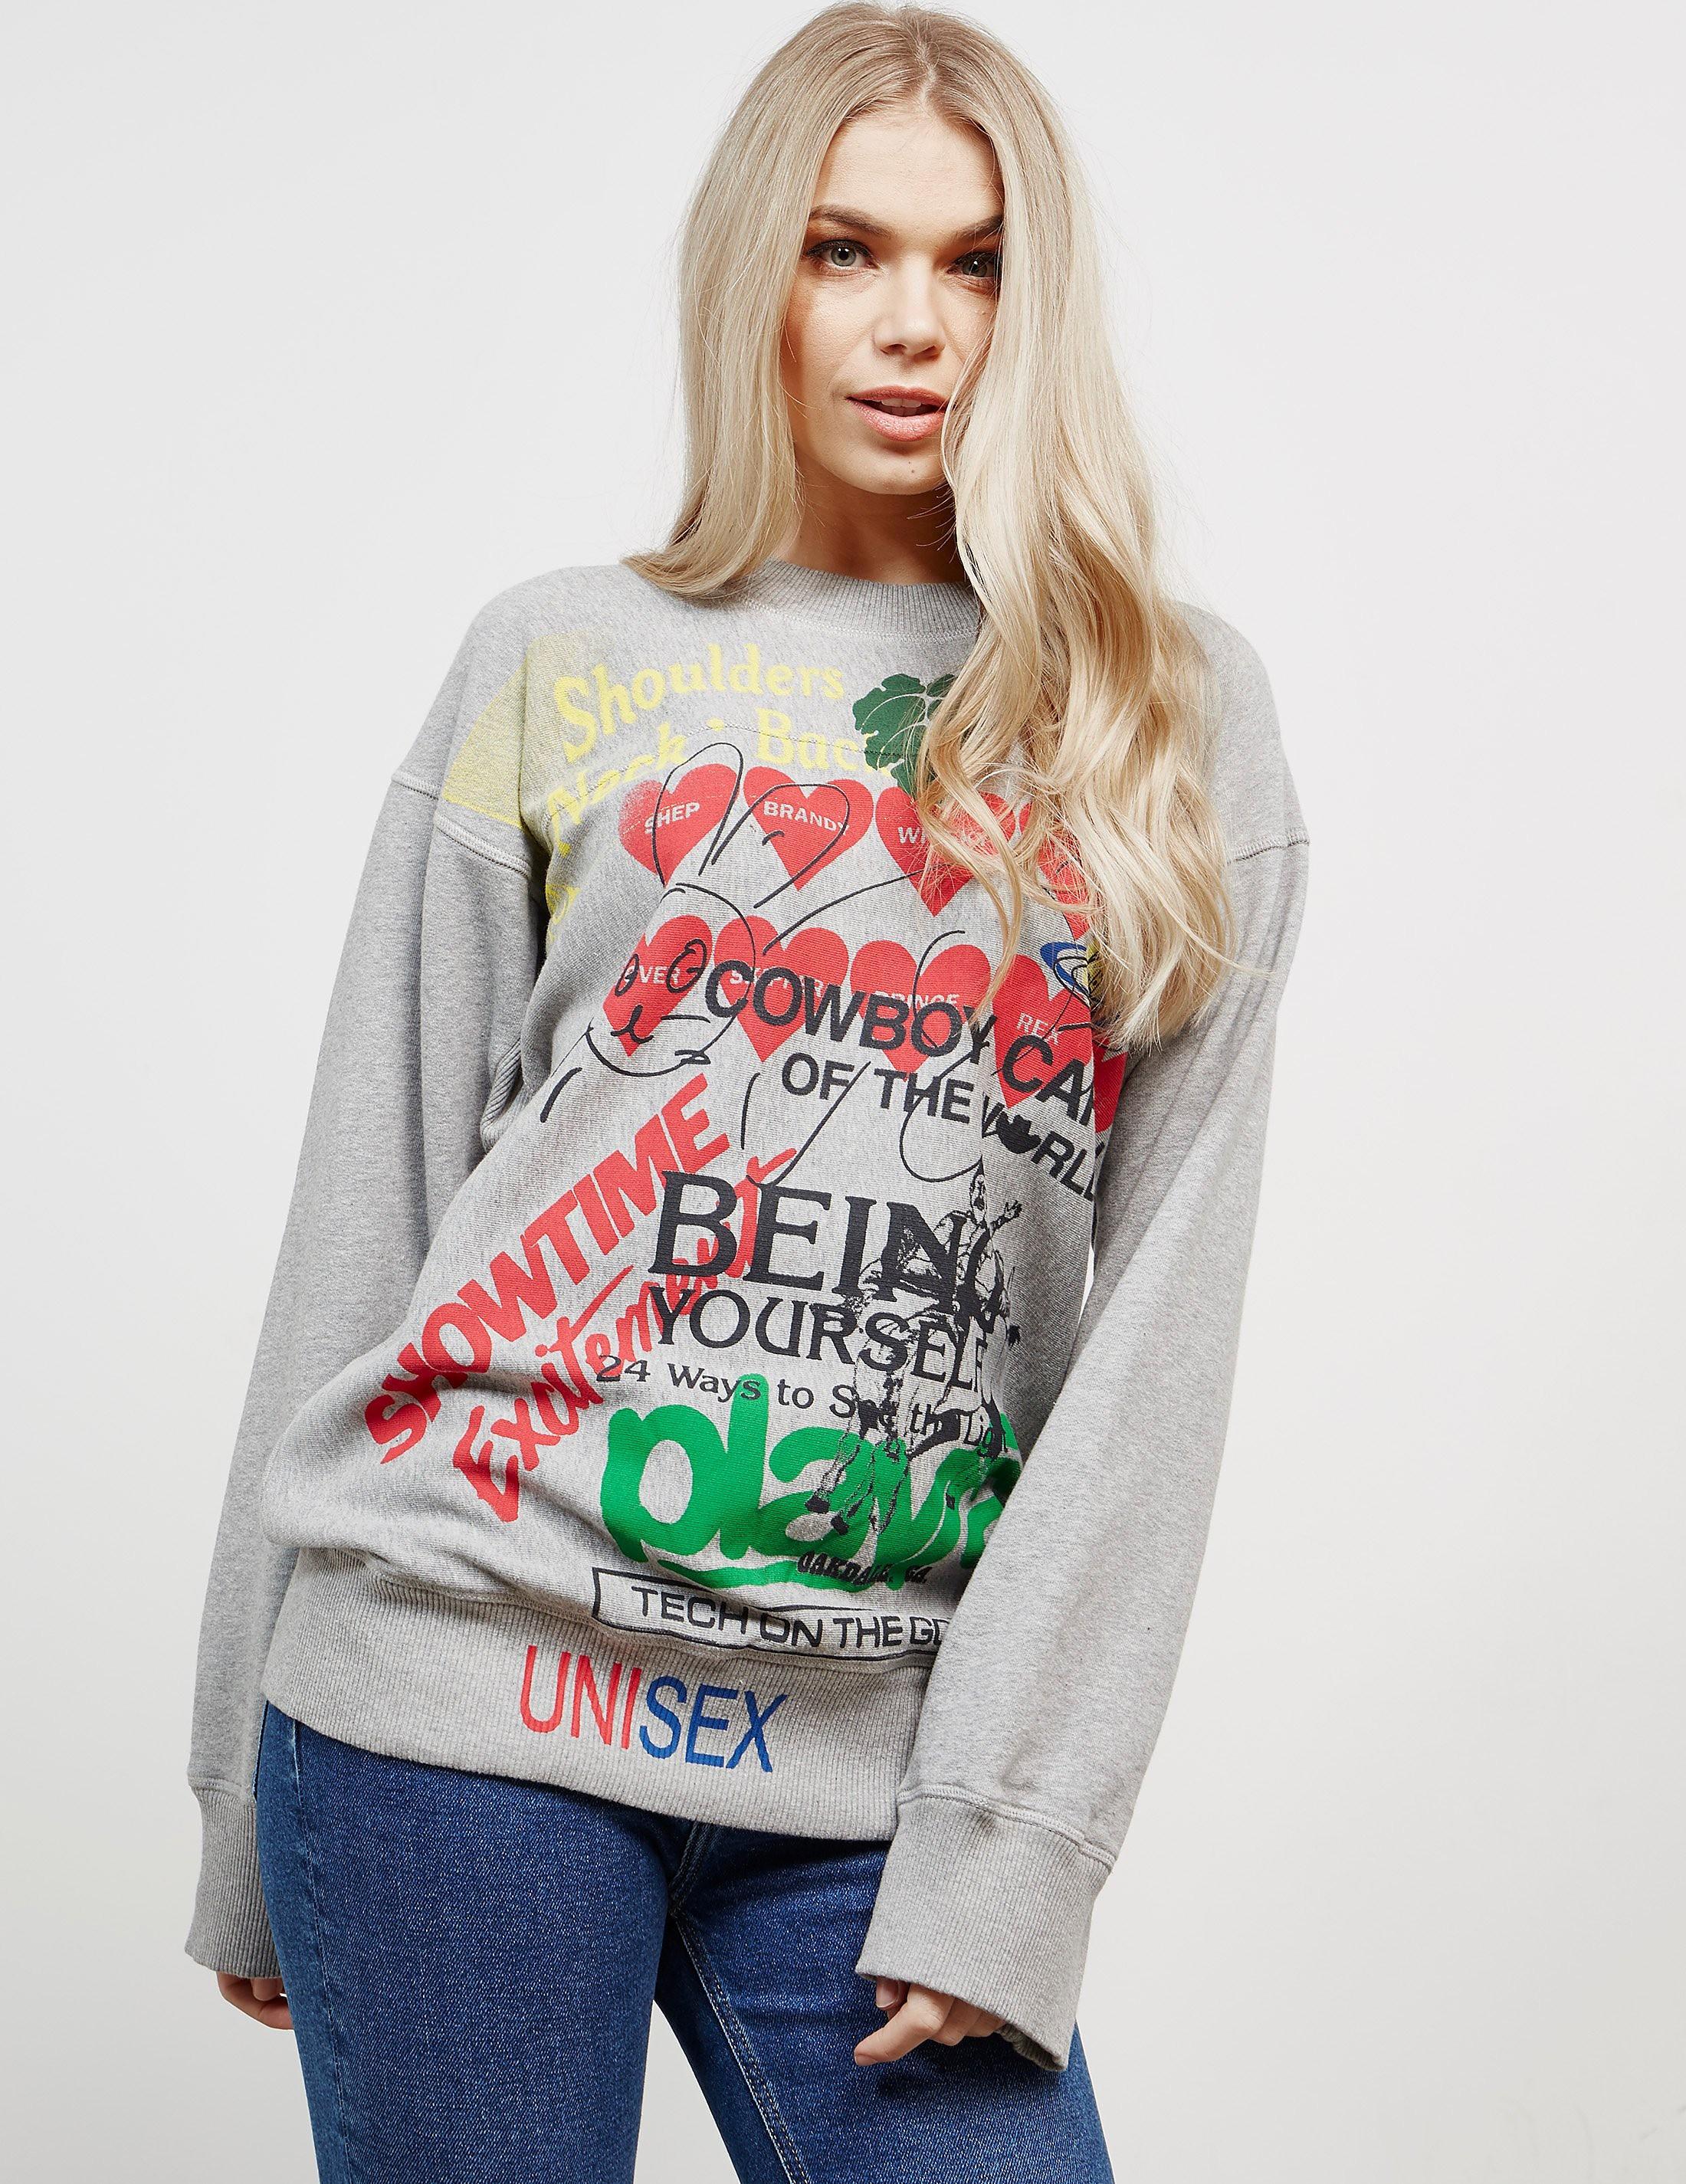 Vivienne Westwood Anglomania Square Sweatshirt